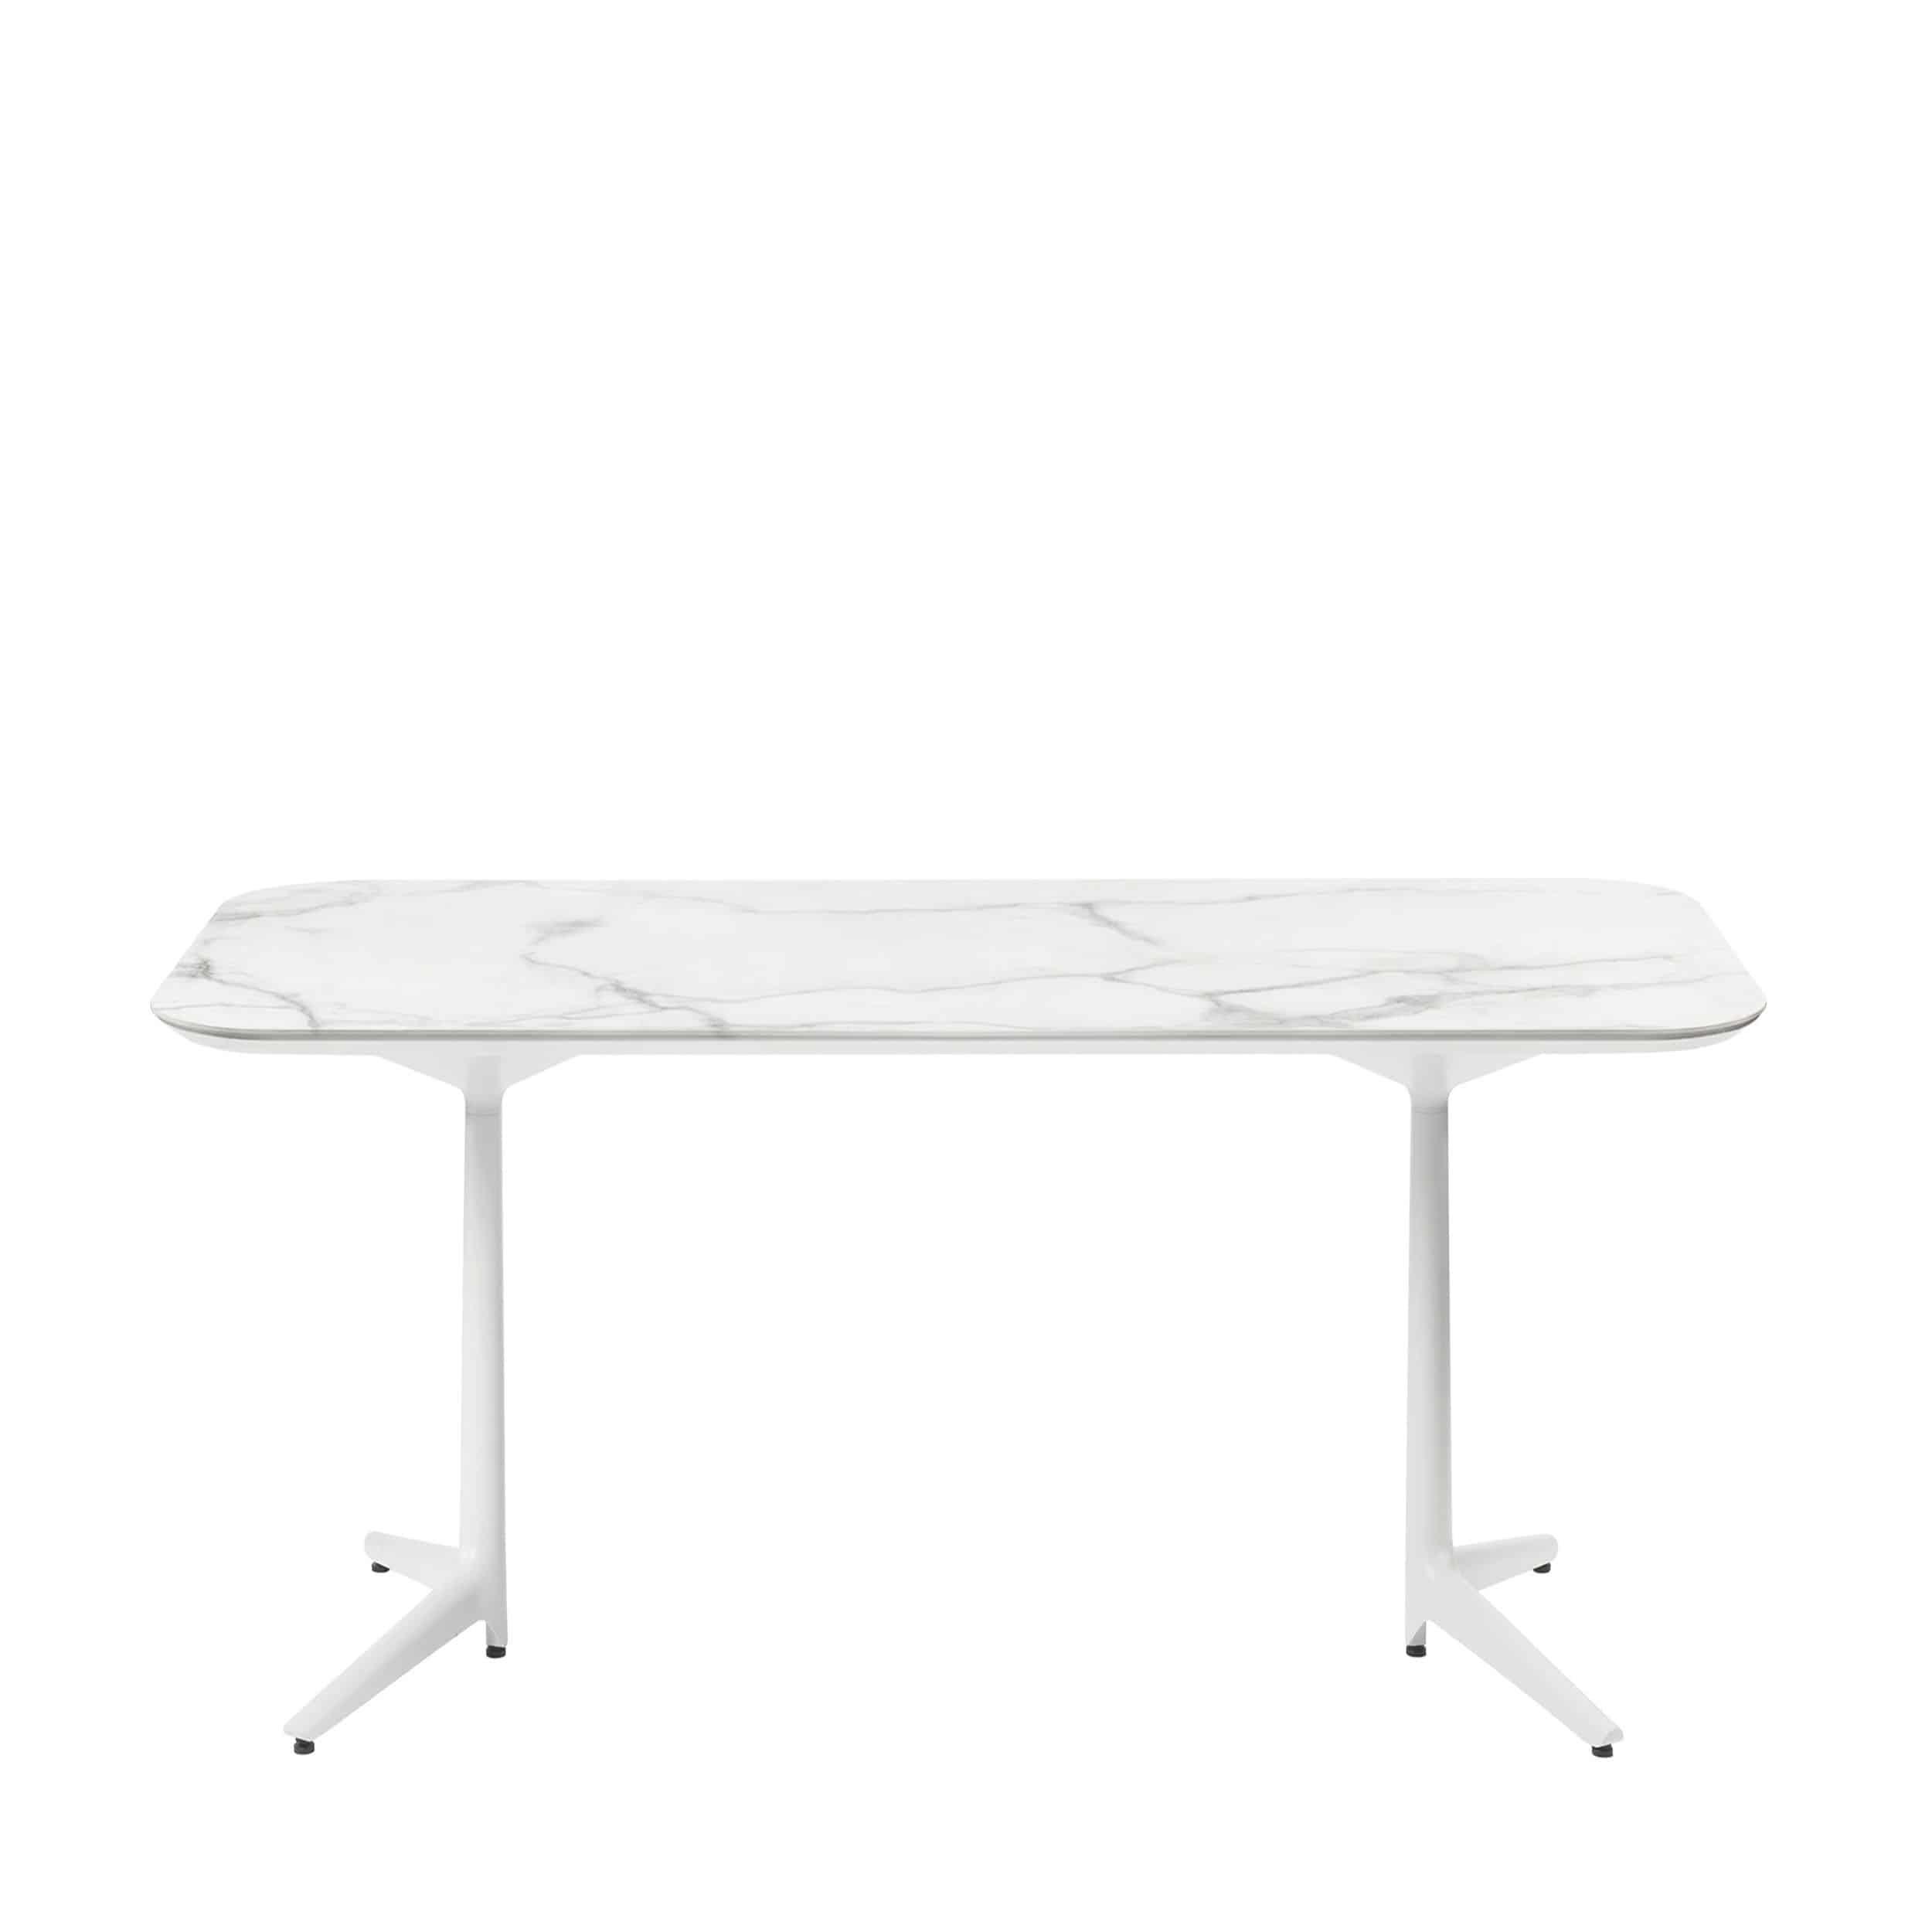 Multiplo Keramik Tisch rechteckig mit Kreuzfuß